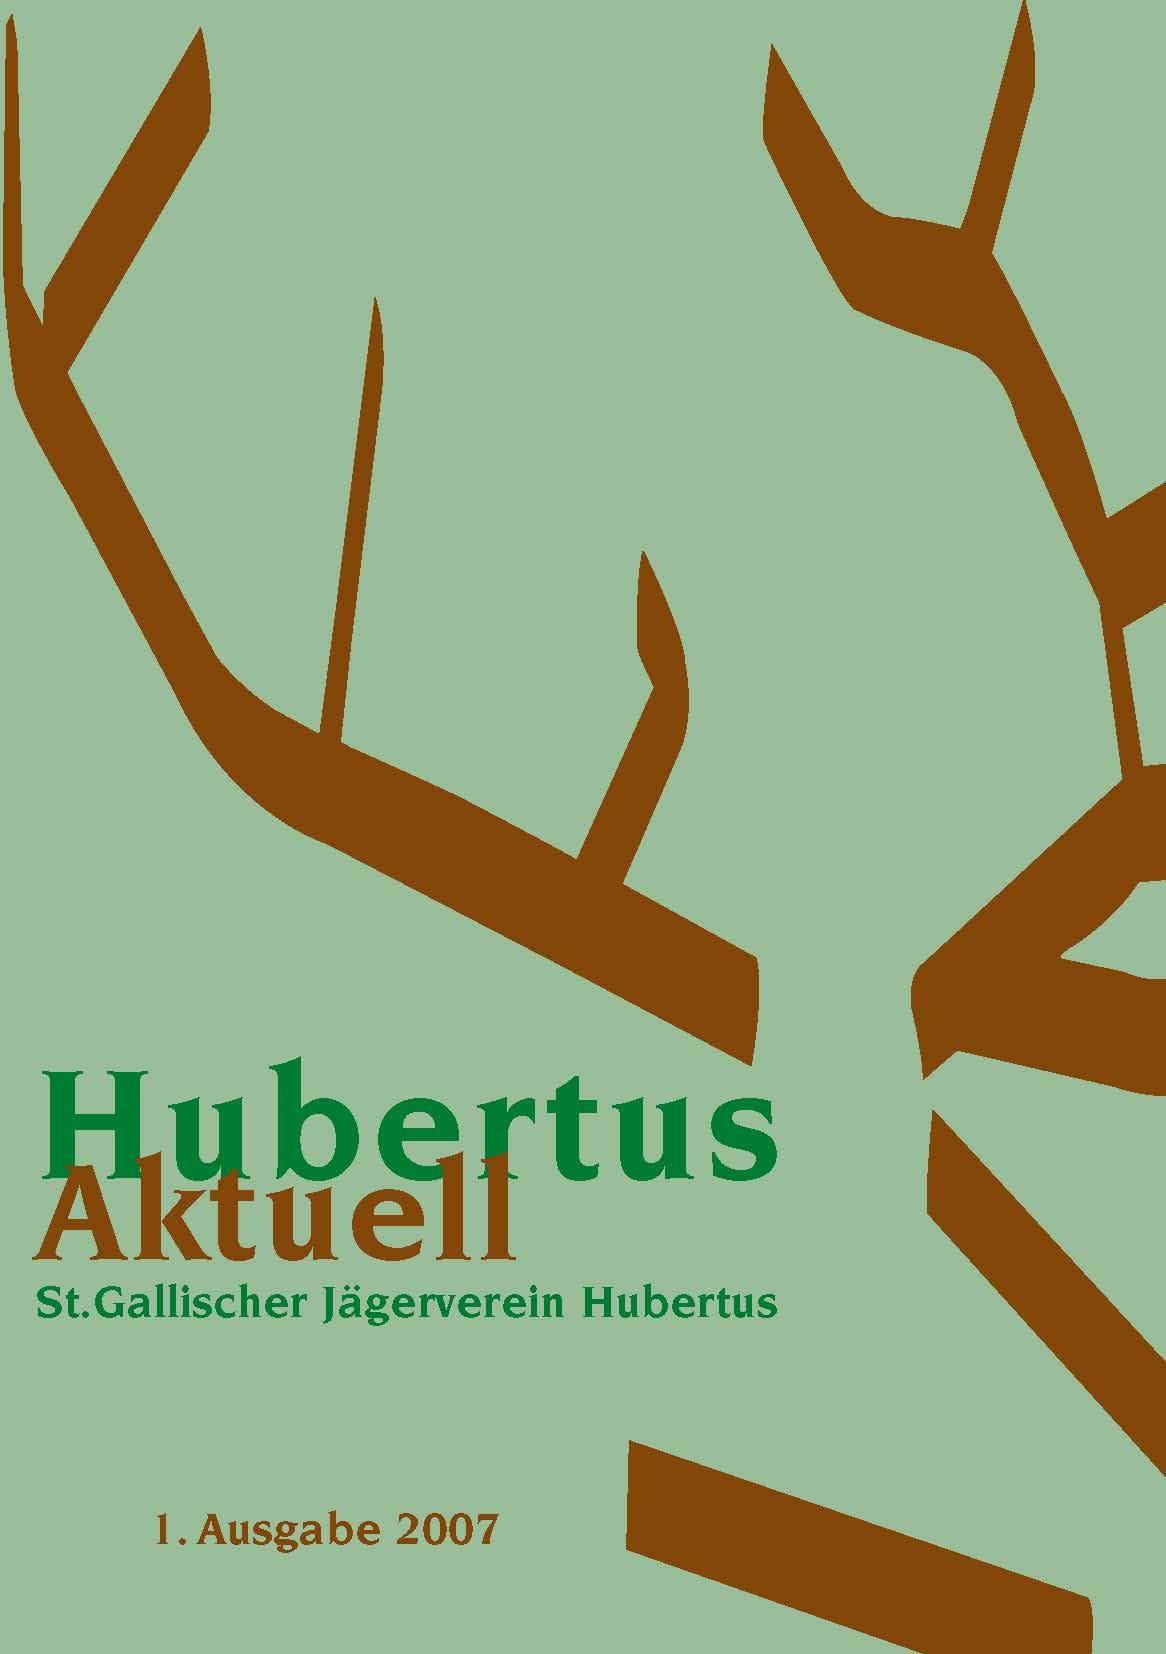 hubertus akutell 01 2007